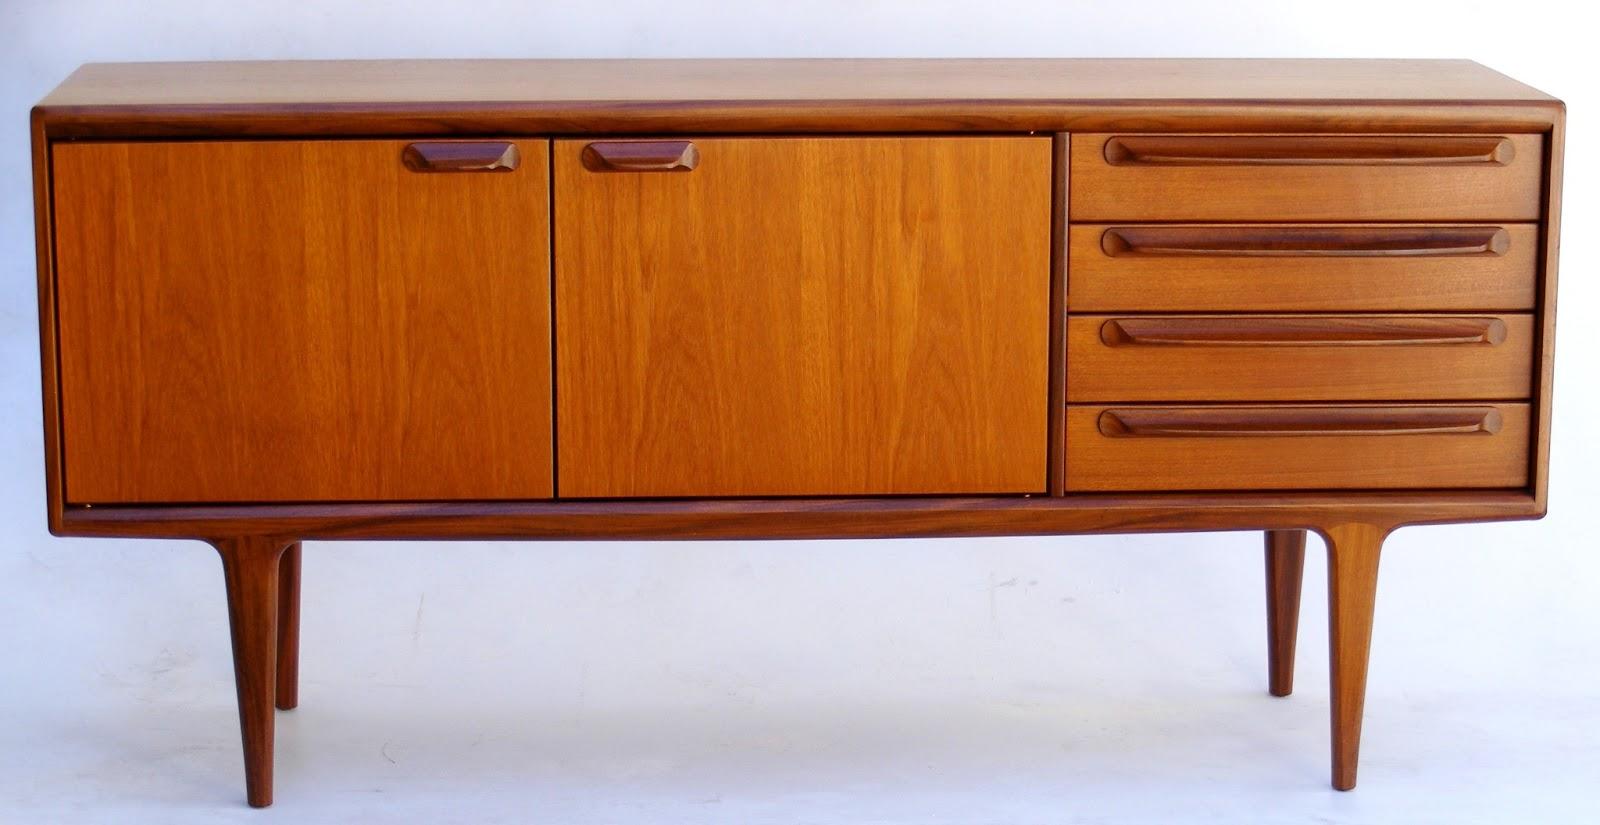 Vamp furniture this weeks new vintage furniture stock at for 60s furniture design